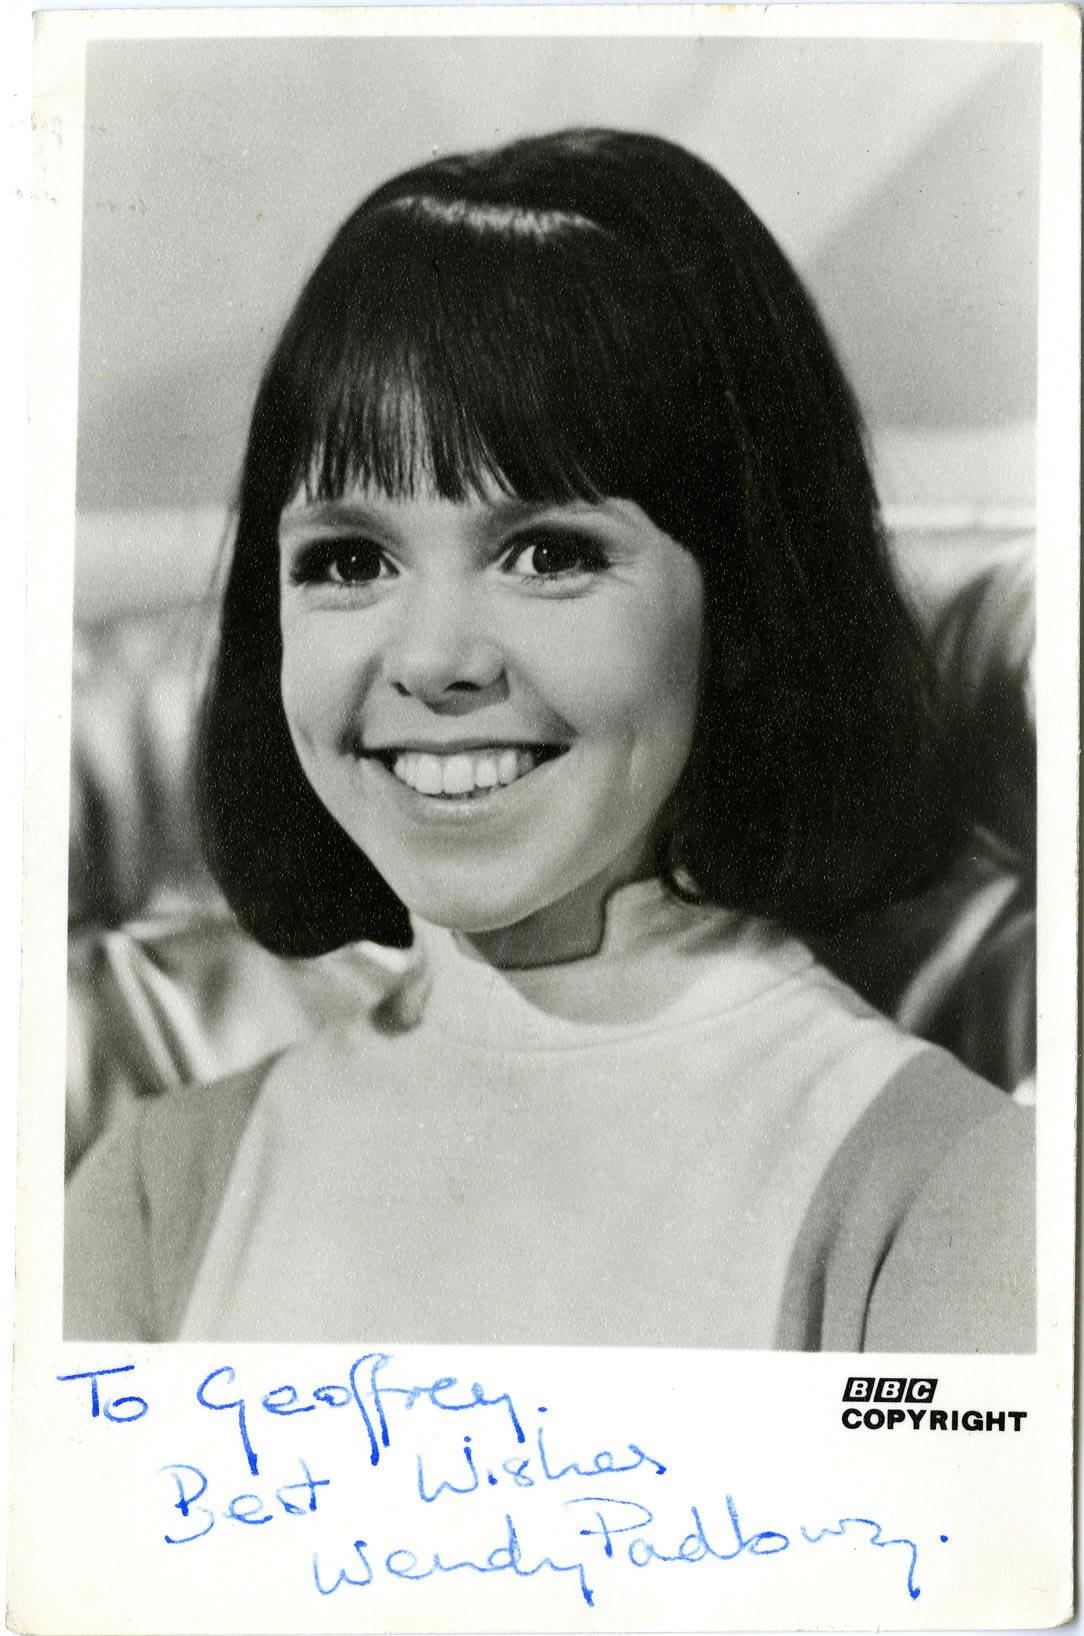 BBC TV Cast Card for Wendy Padbury as Zoe Heriot